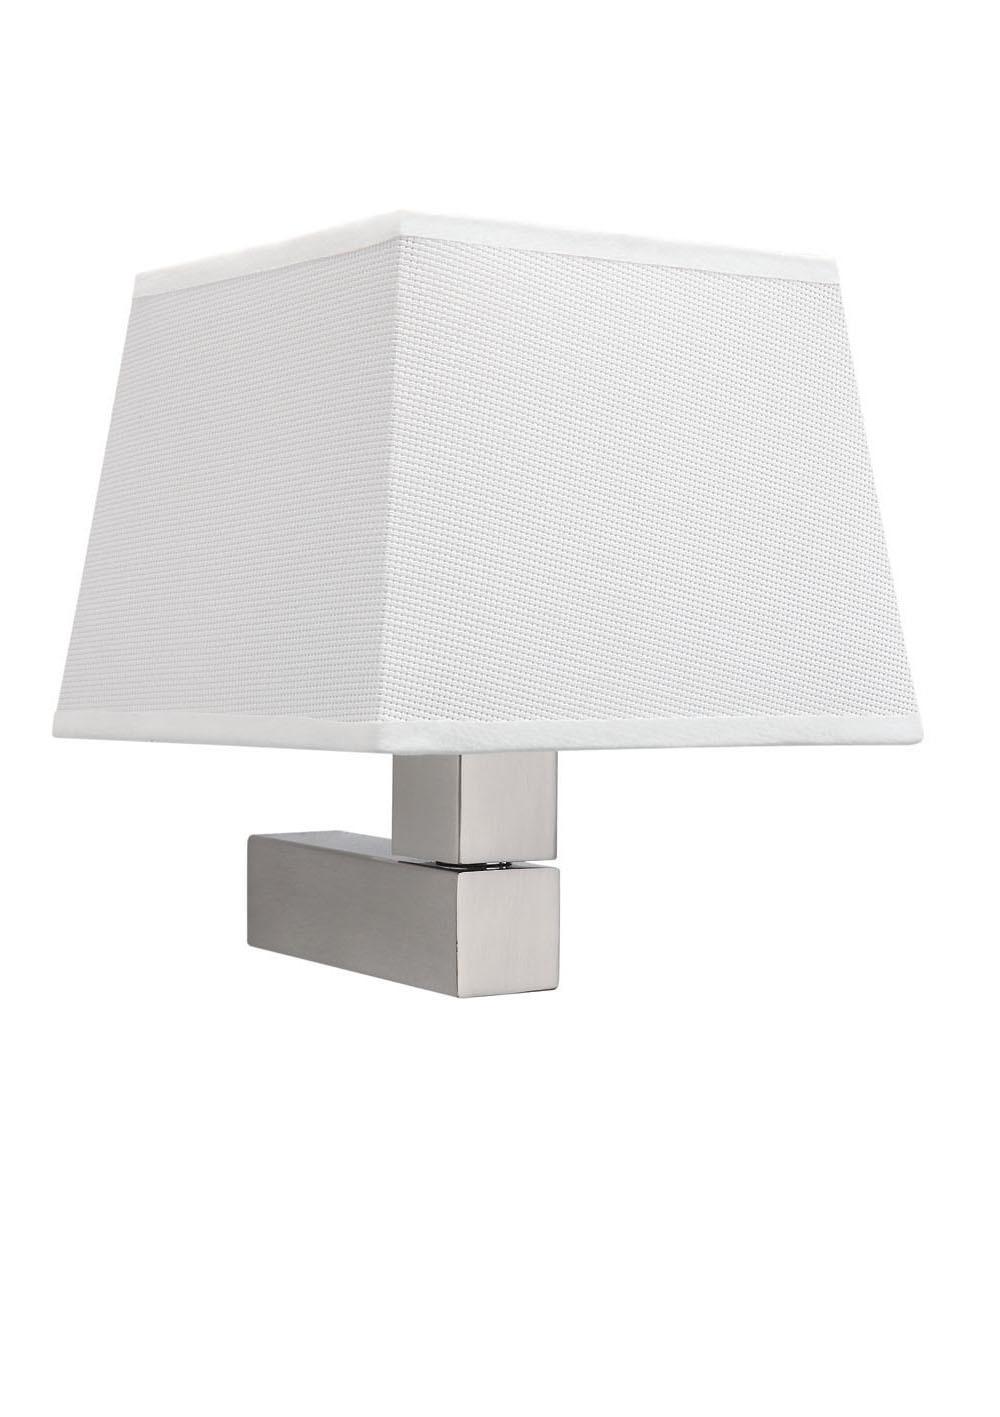 Bahia Wall Lamp with square white Fabric shade 1 Light E27 Satin Nickel